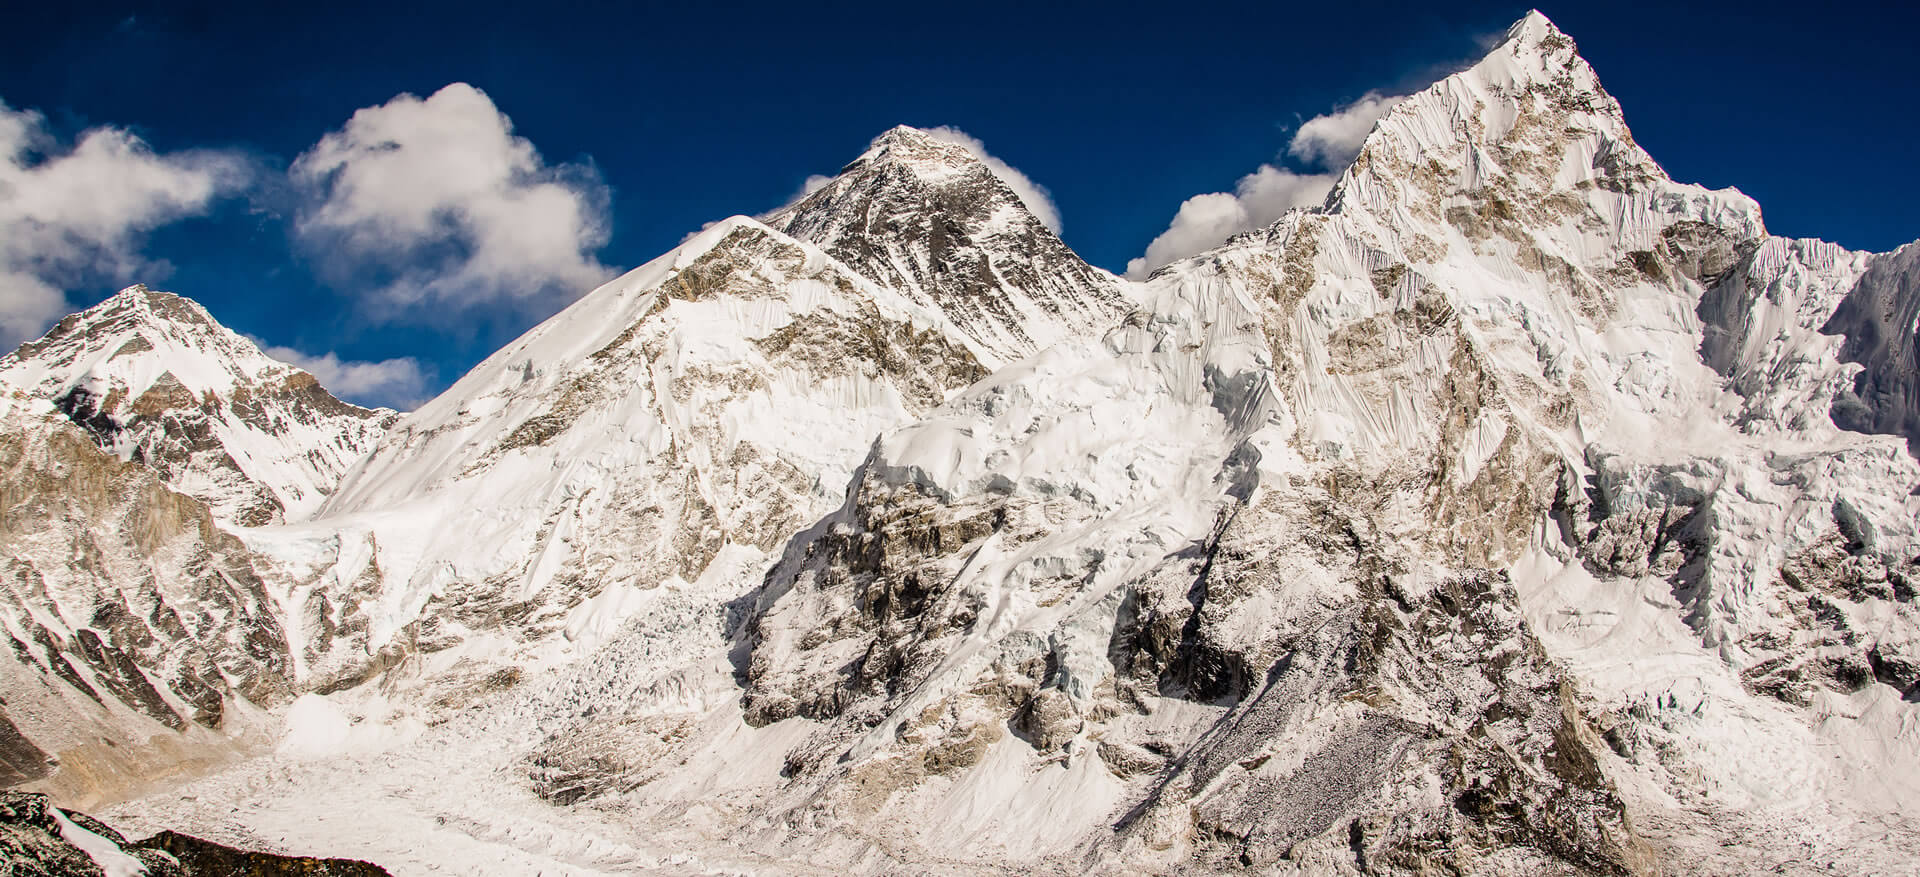 Trekking in Nepal Image